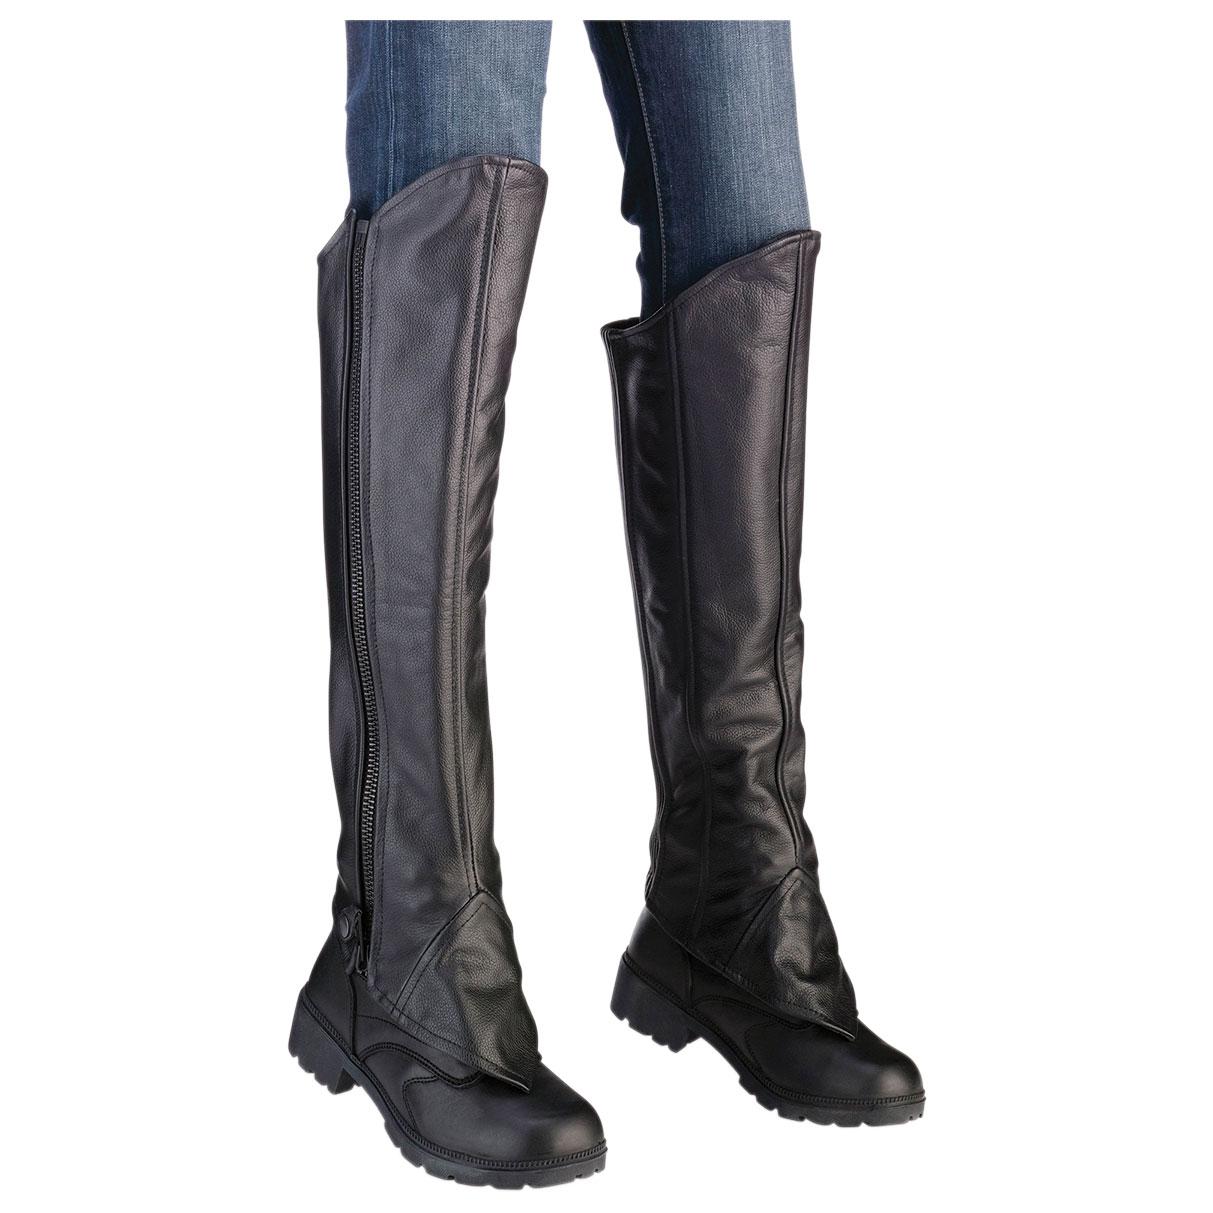 Z1R Women's Black Leather Half Chaps